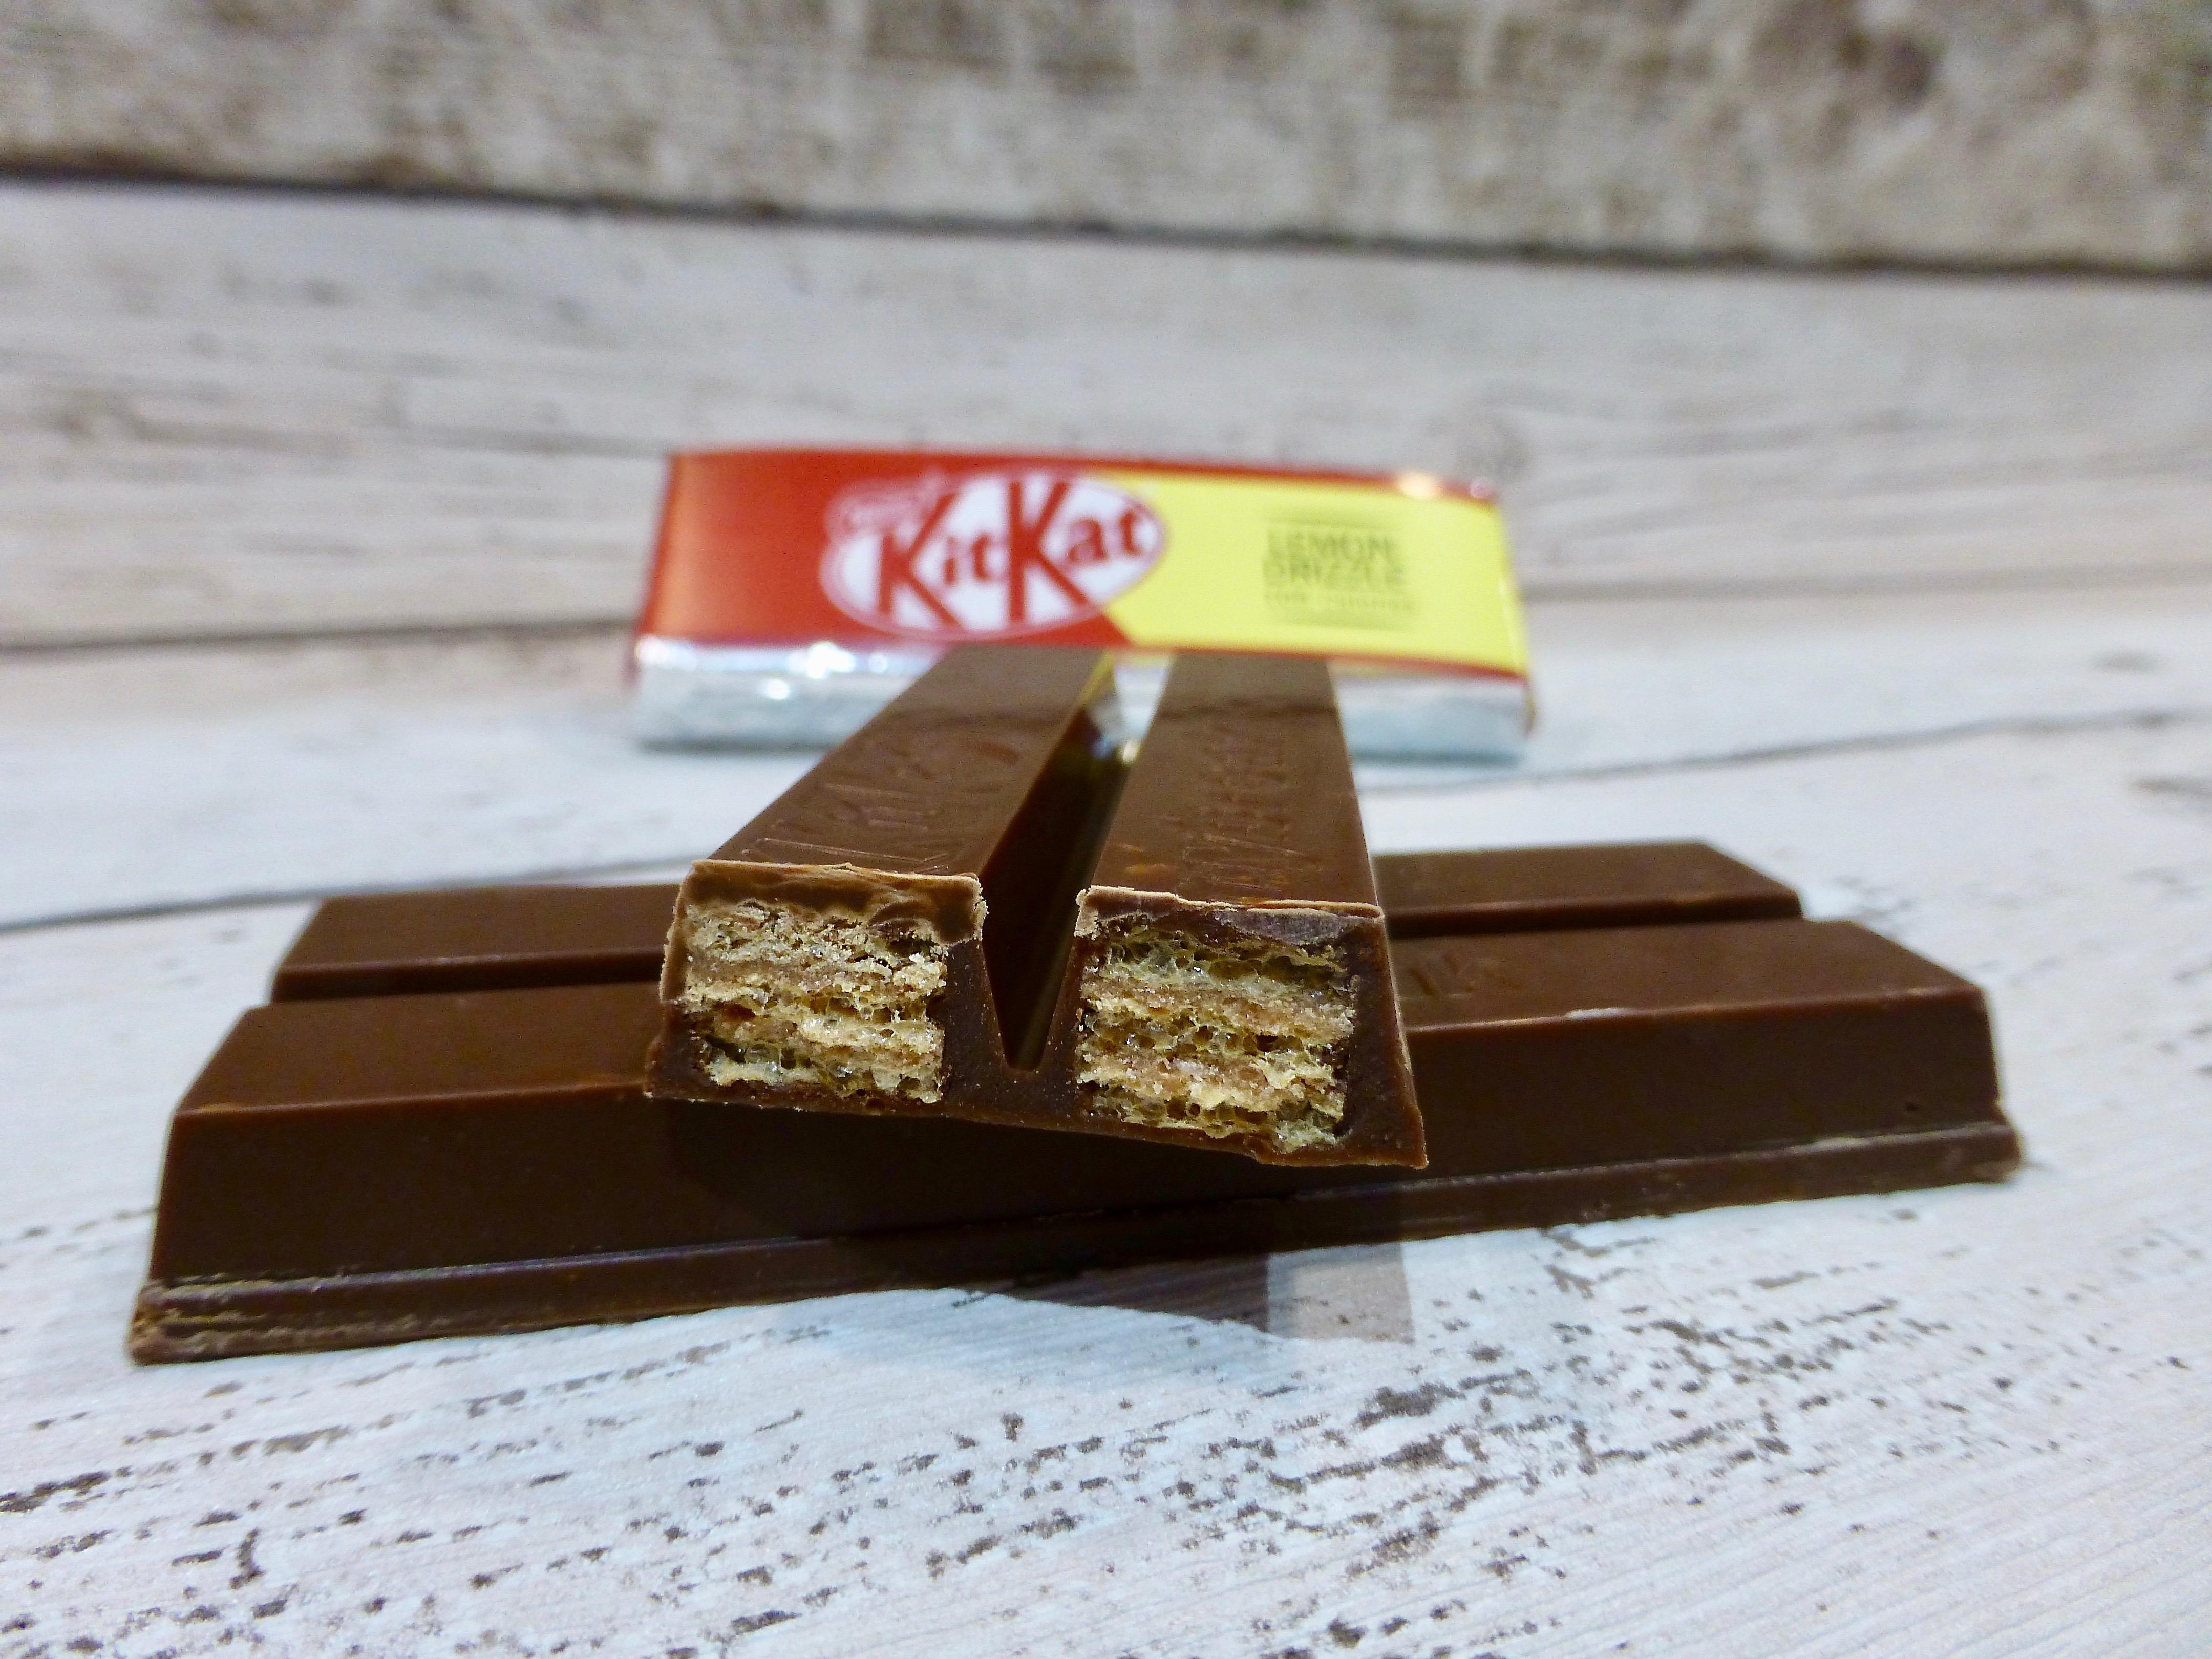 KitKat Lemon Drizzle Fingers